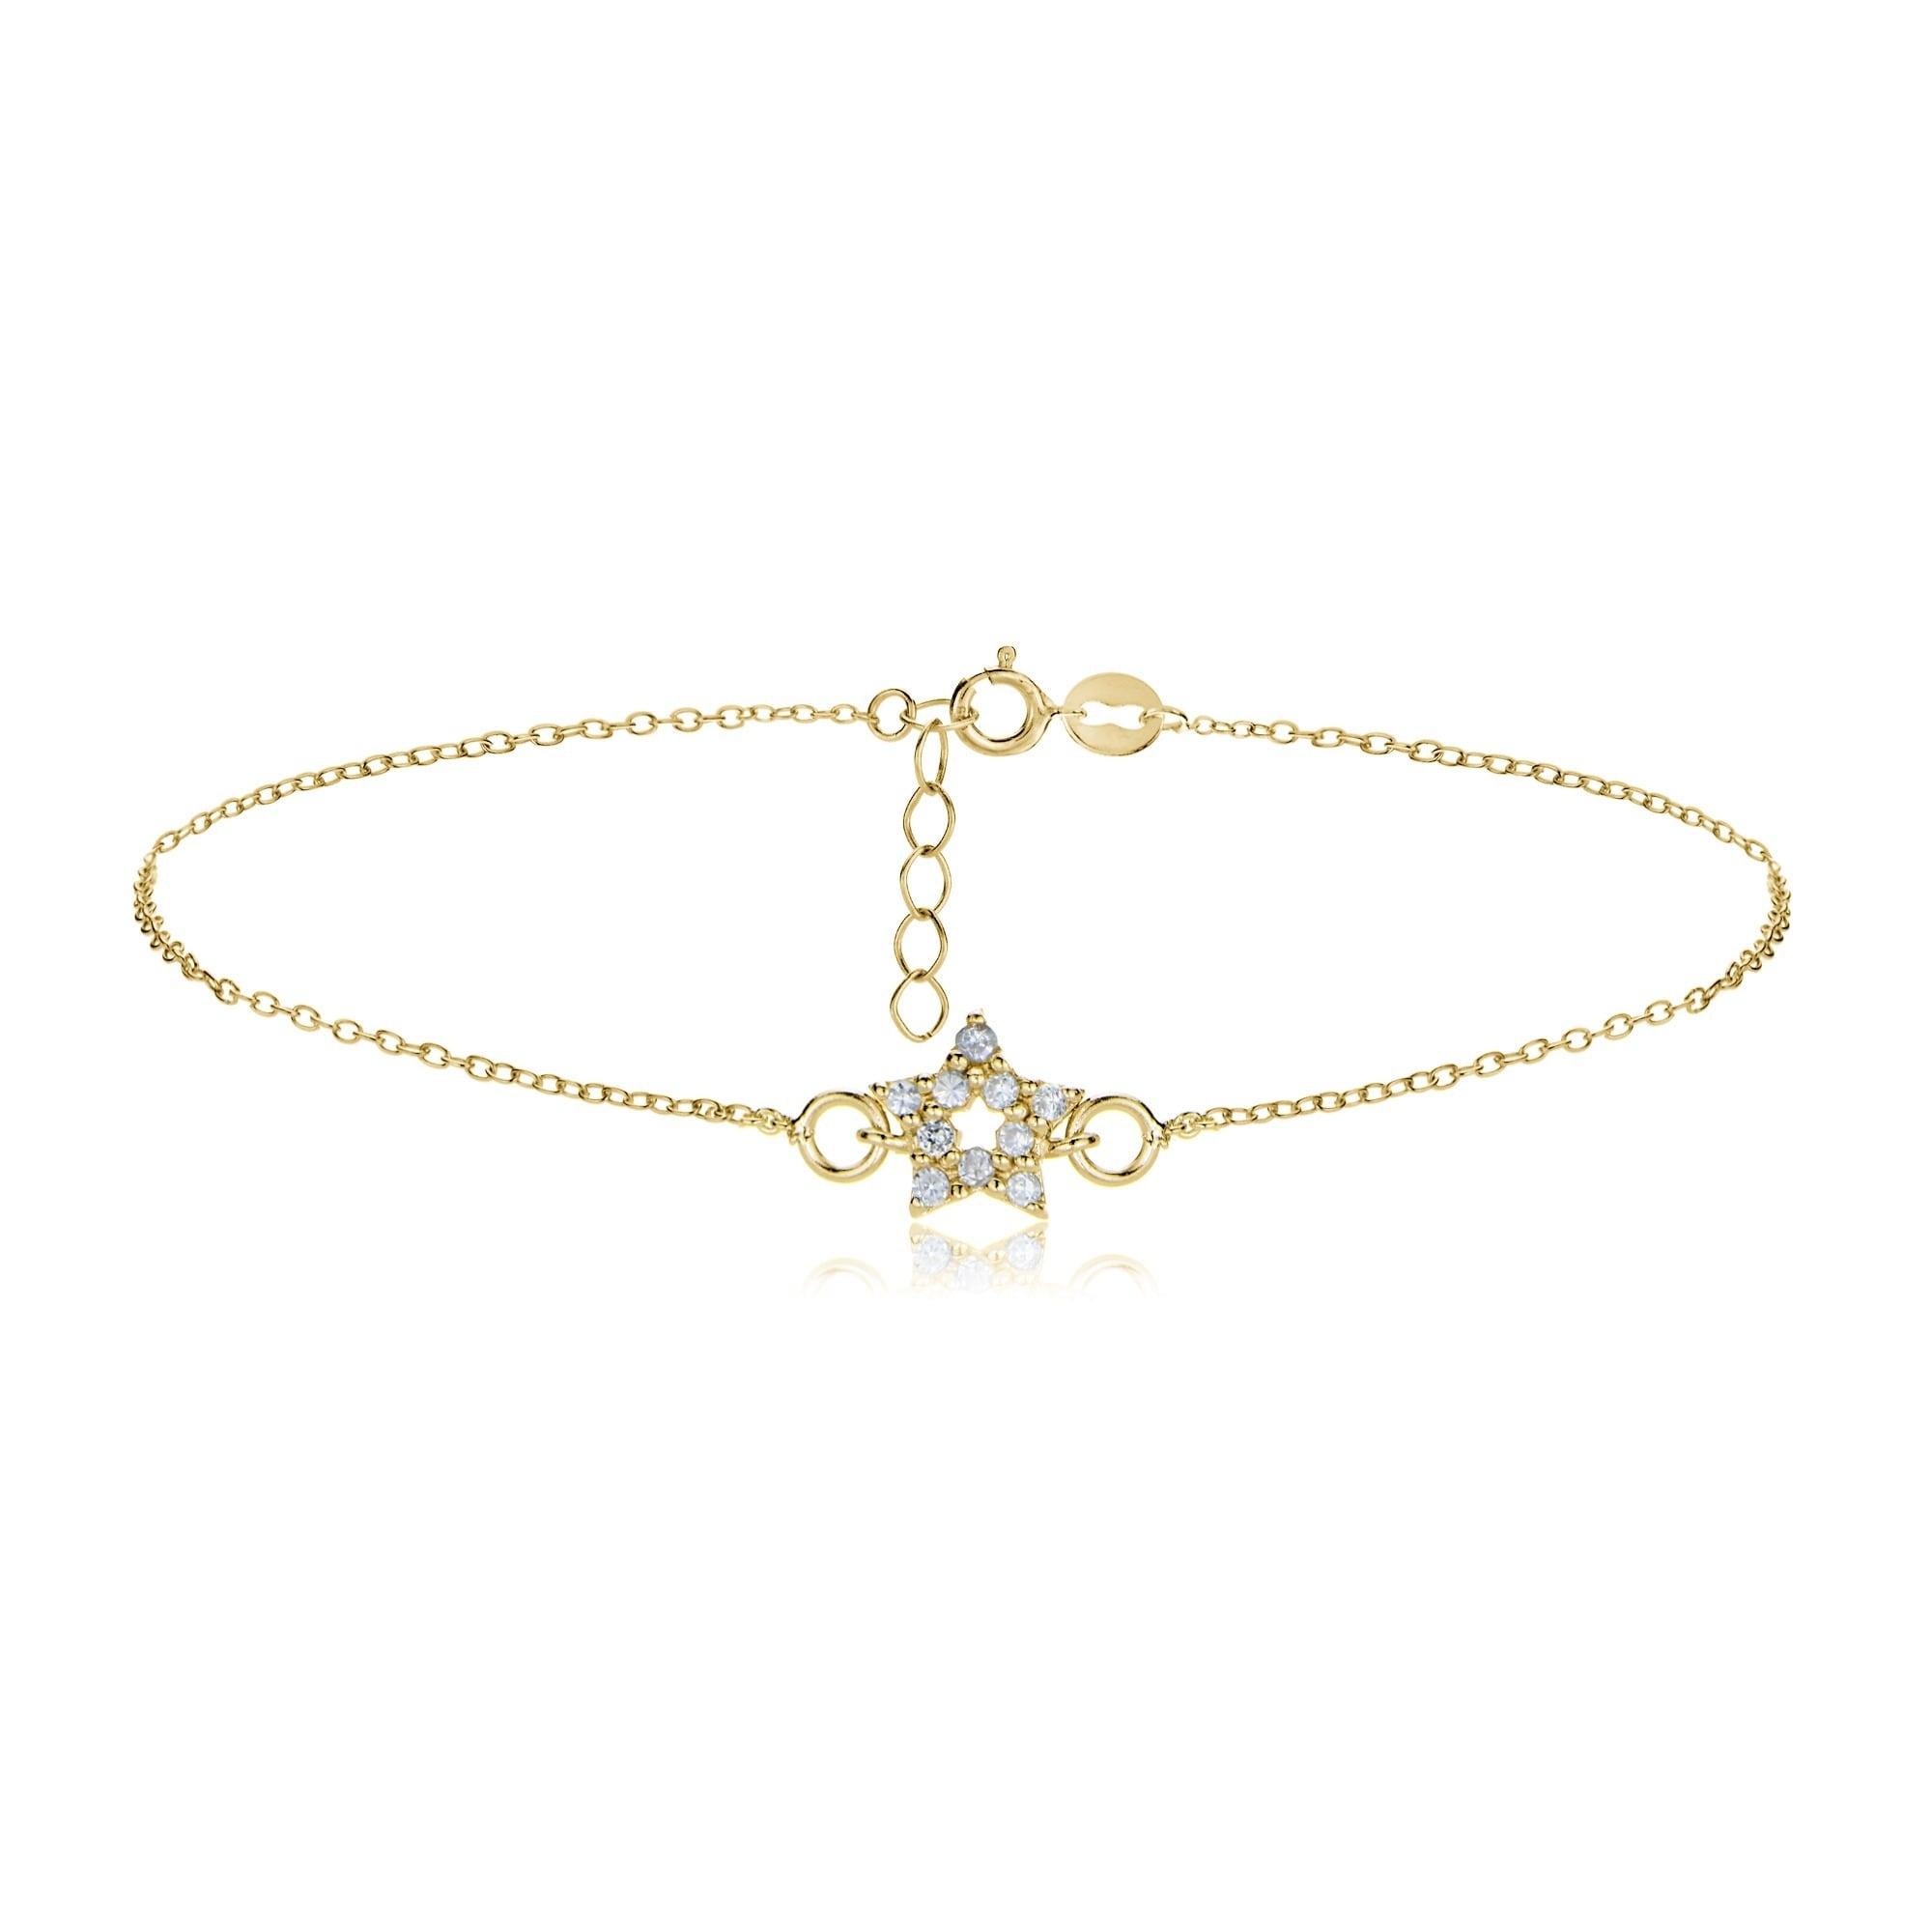 gold star anklet Cubic zirconia star anklet minimalist anklet dainty star anklet silver star shinny anklet cz star anklet gift 123